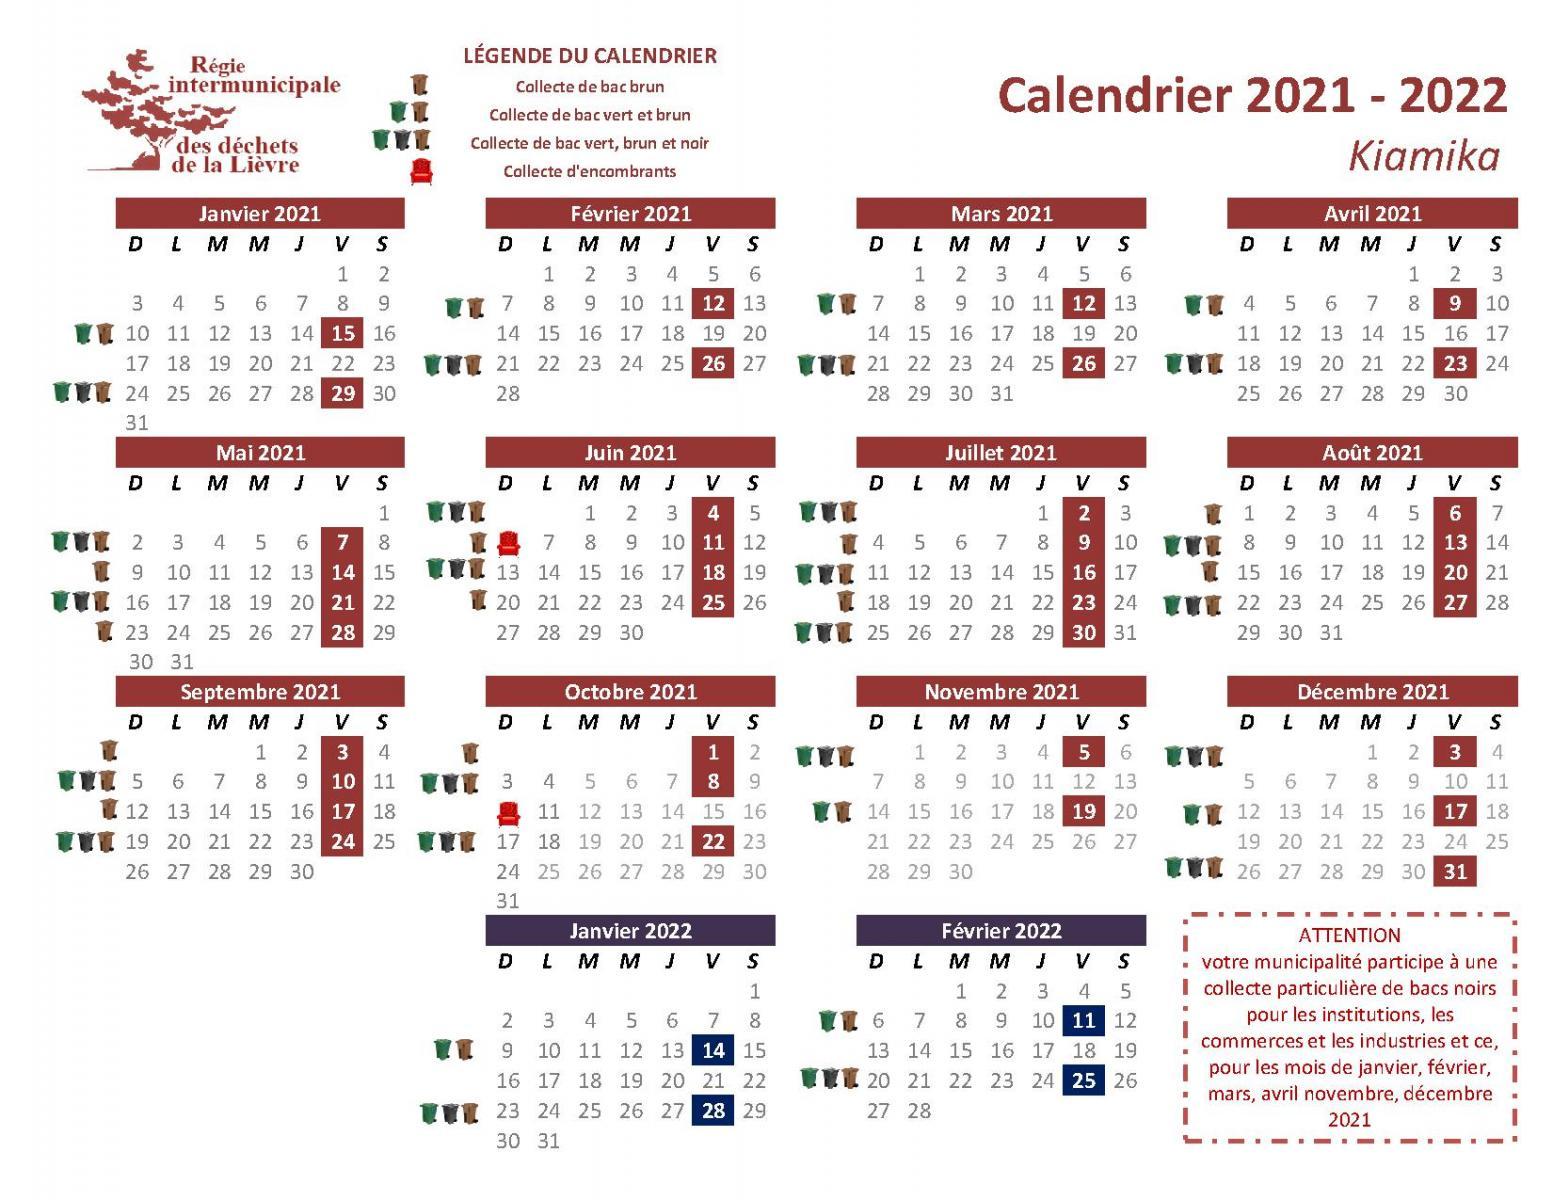 Calendrier Des Collectes 2021 2022